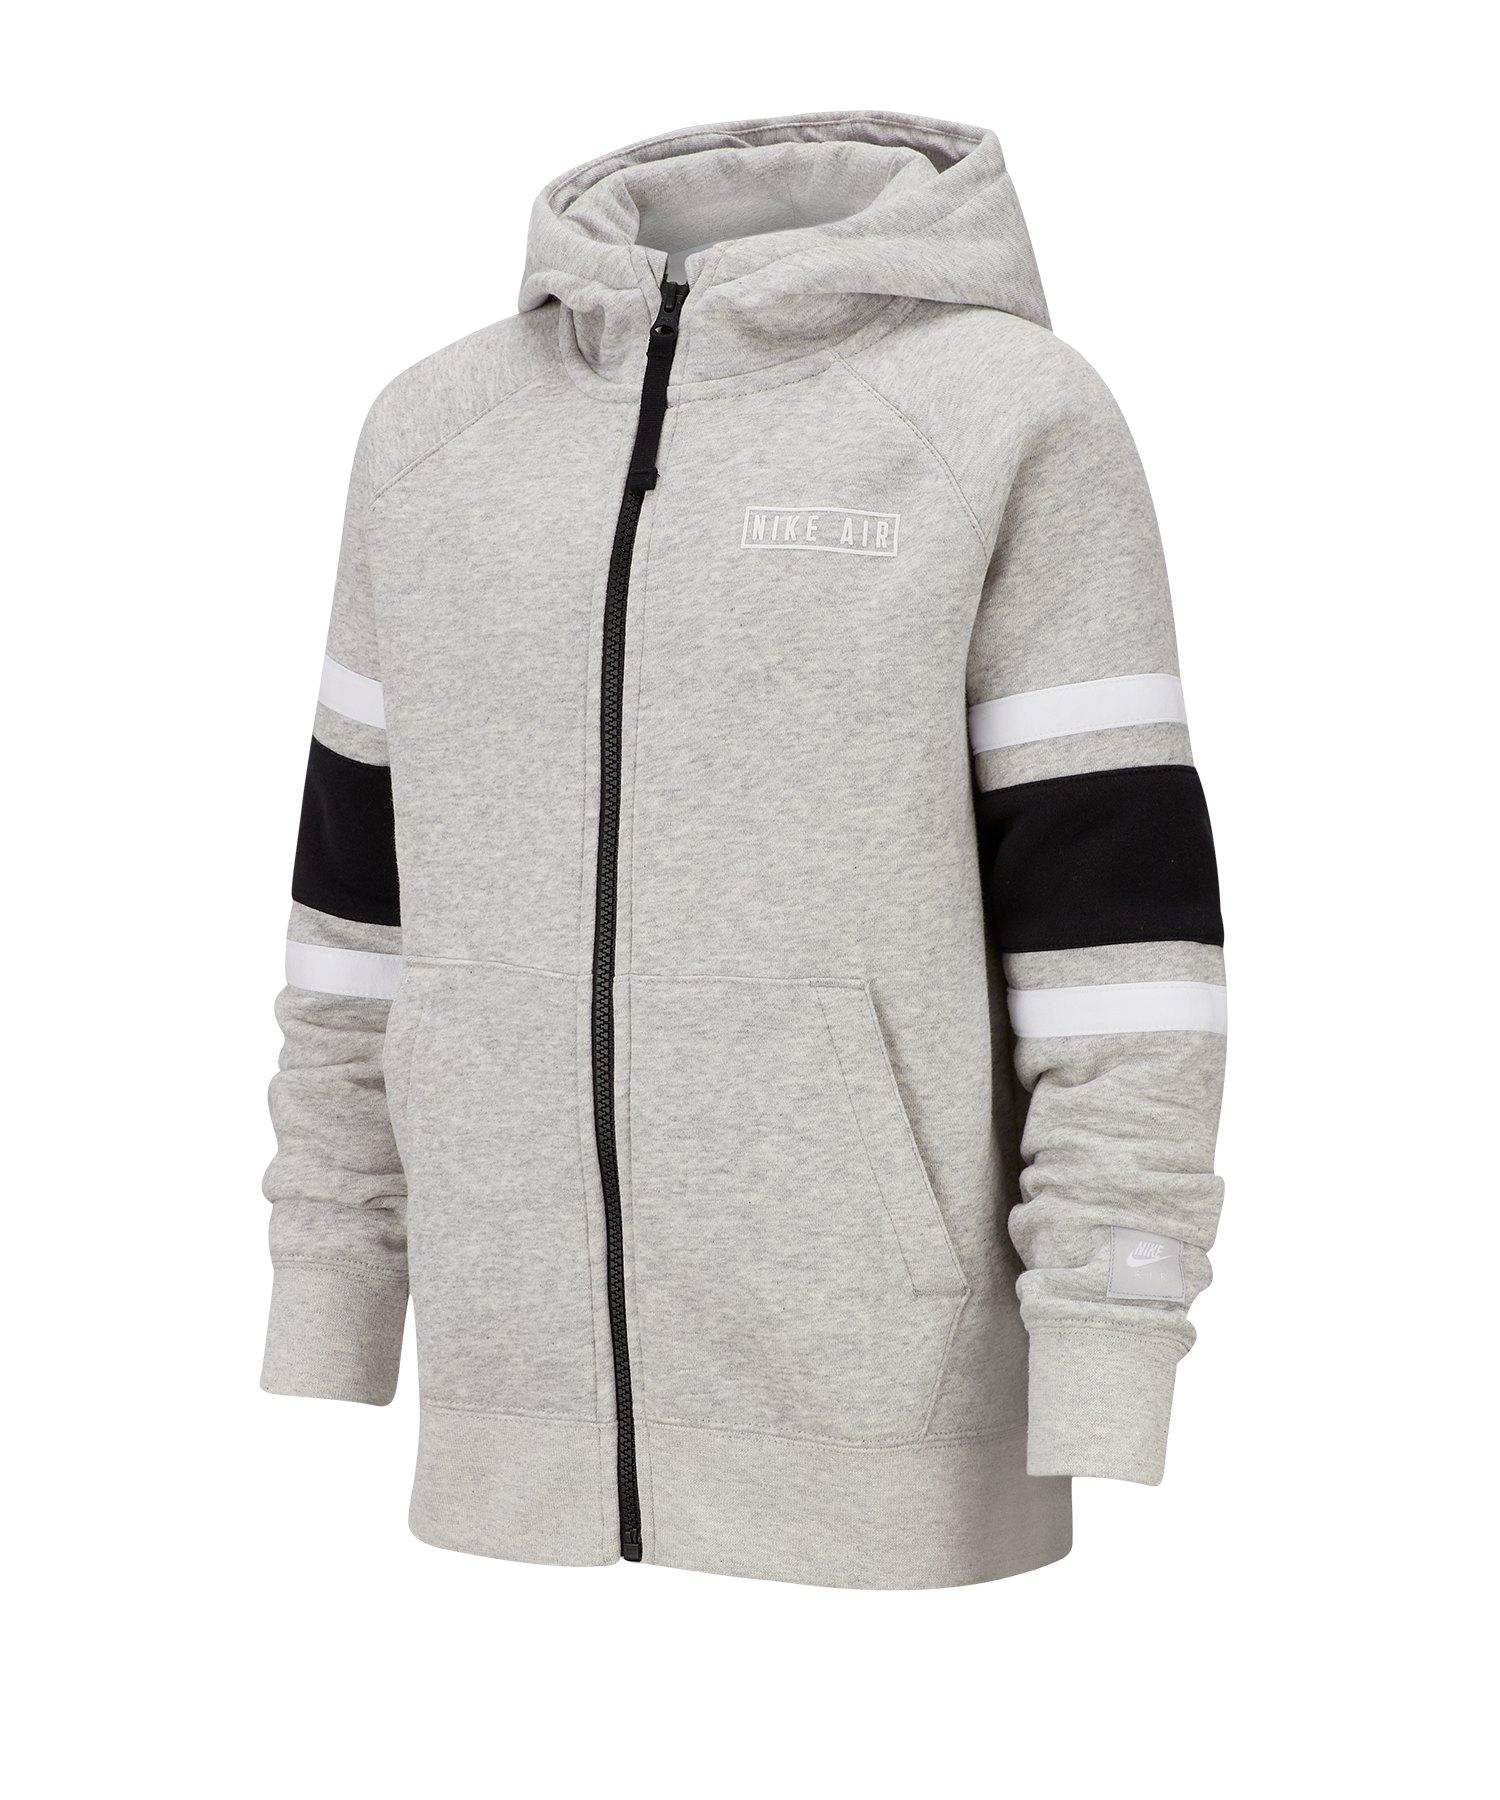 Nike Air Full-Zip Hoody Kapuzenpullover Kids F050 - grau